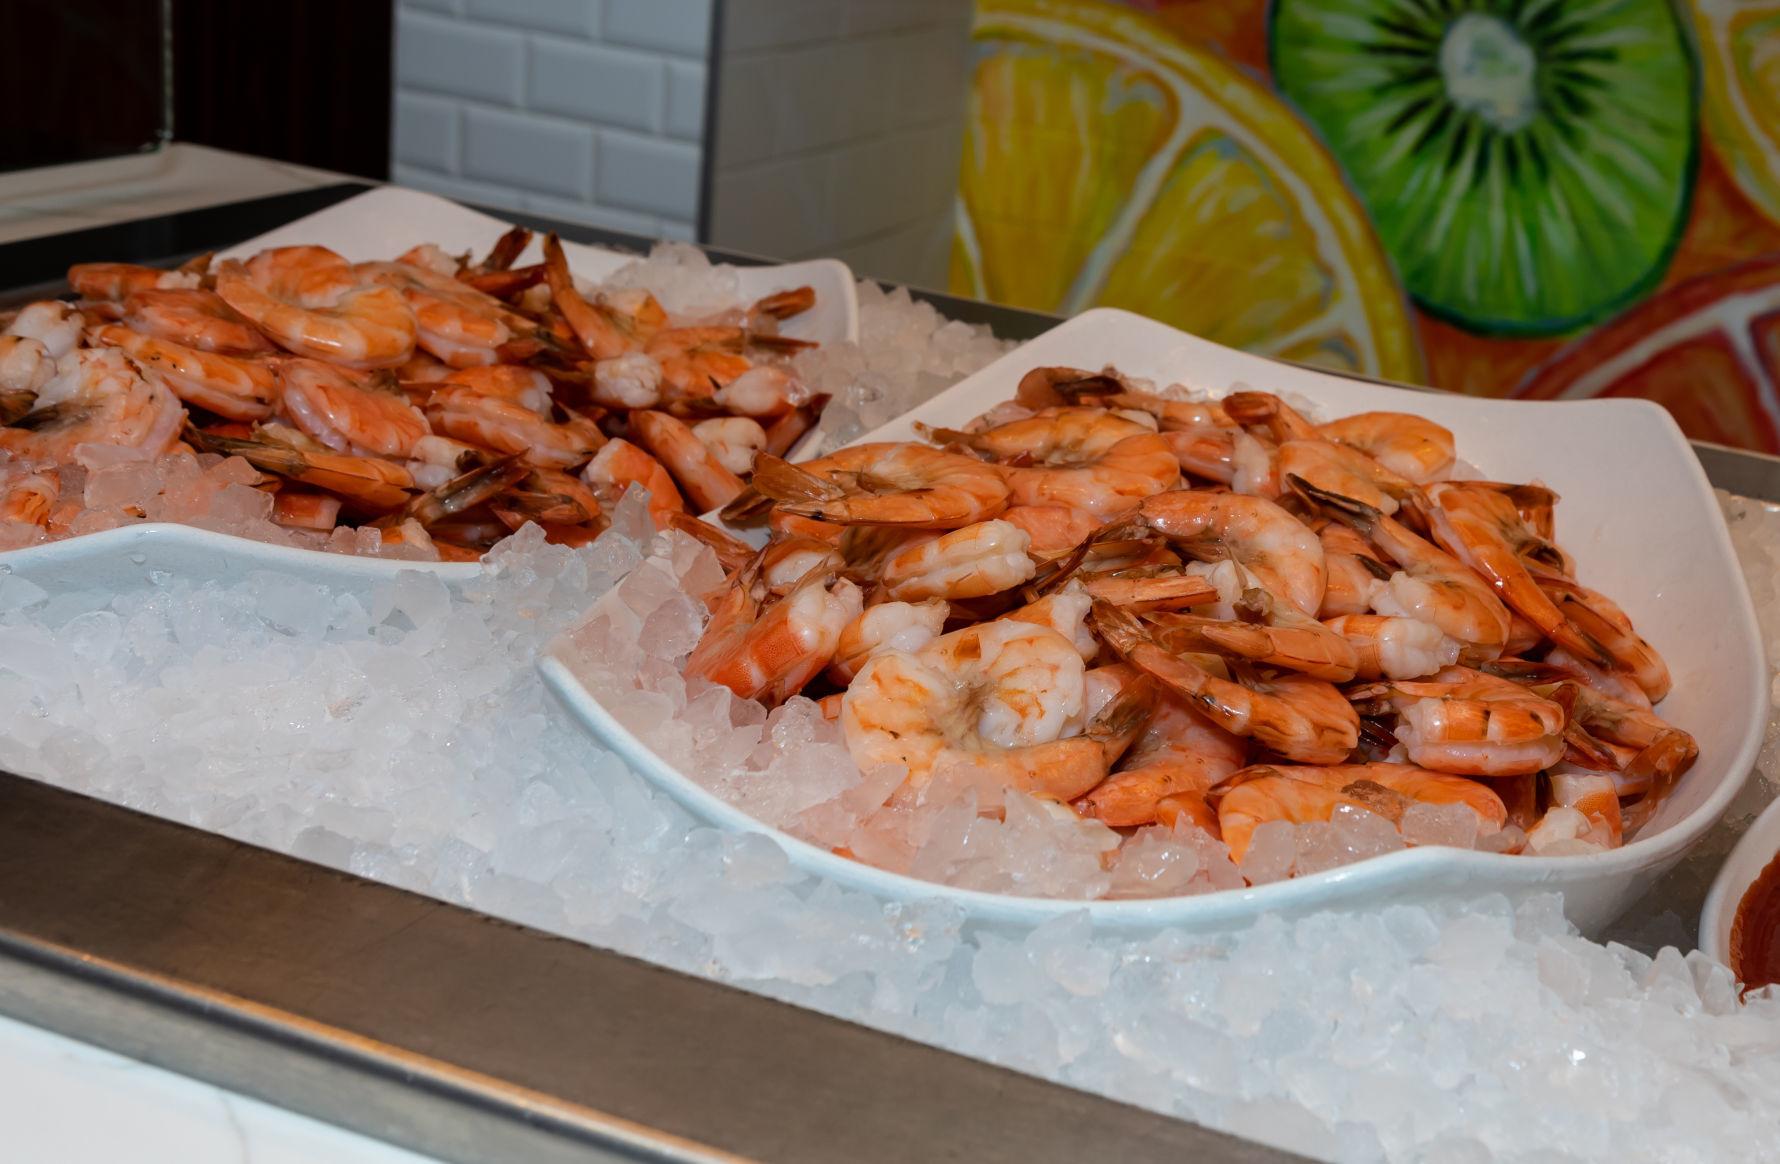 hard rock s fresh harvest buffet brings old traditions into a modern rh atlanticcityweekly com